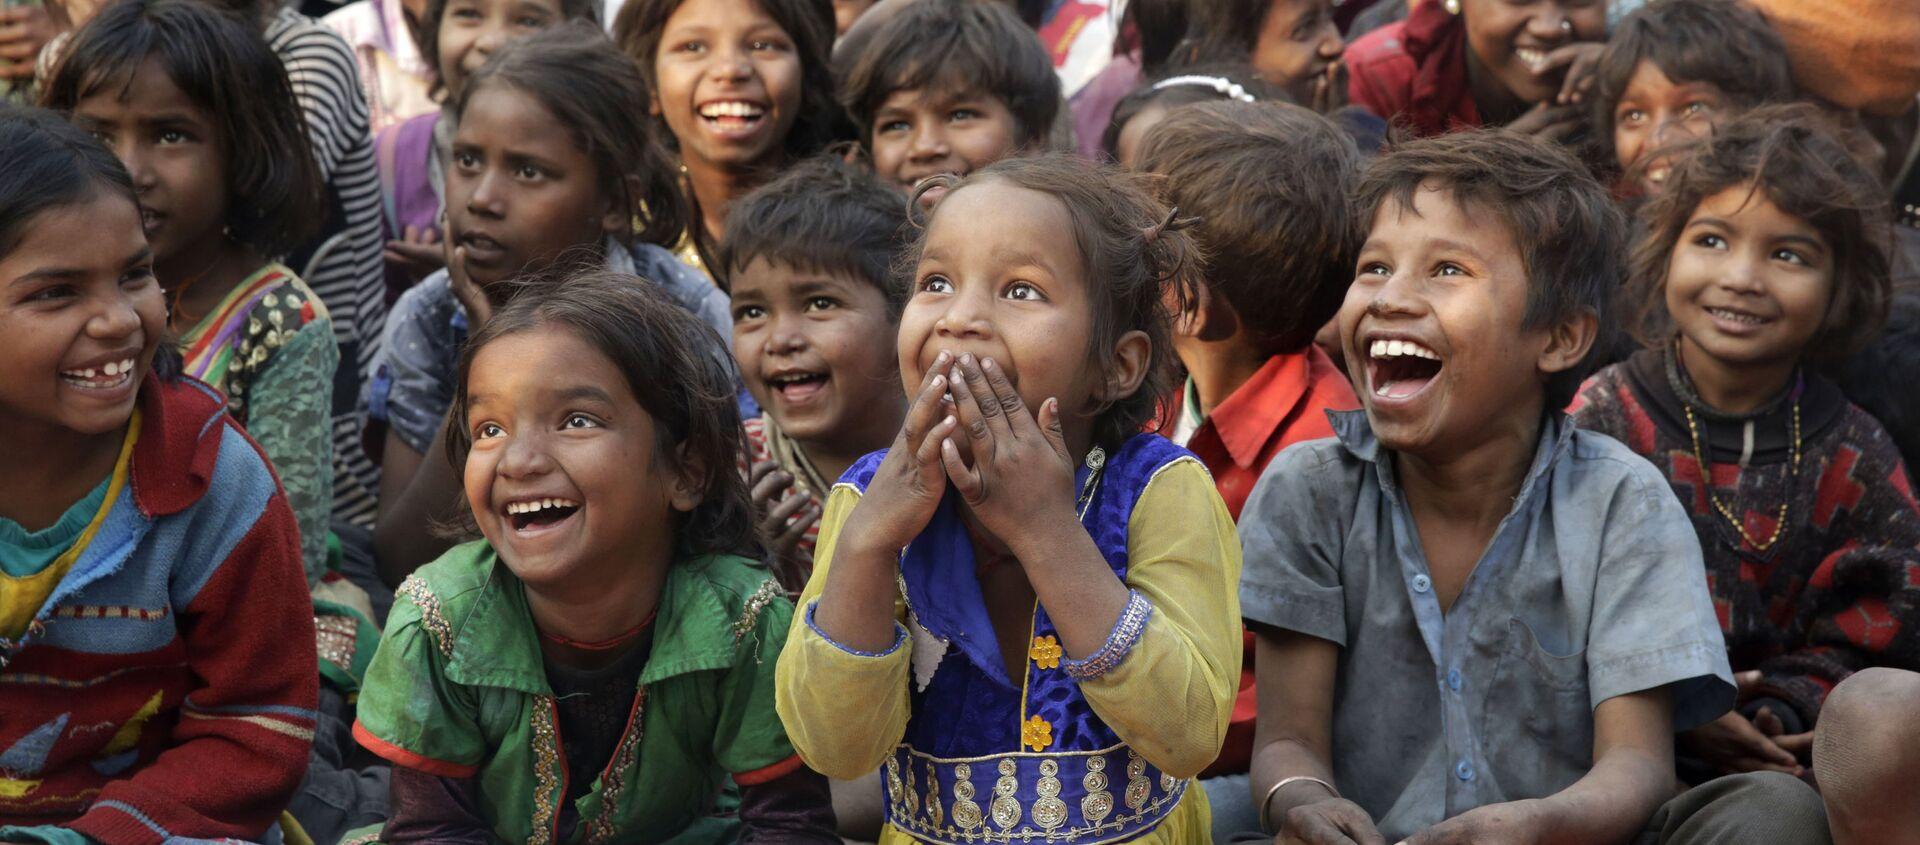 Trẻ em nghèo, Ấn Độ. - Sputnik Việt Nam, 1920, 16.06.2020